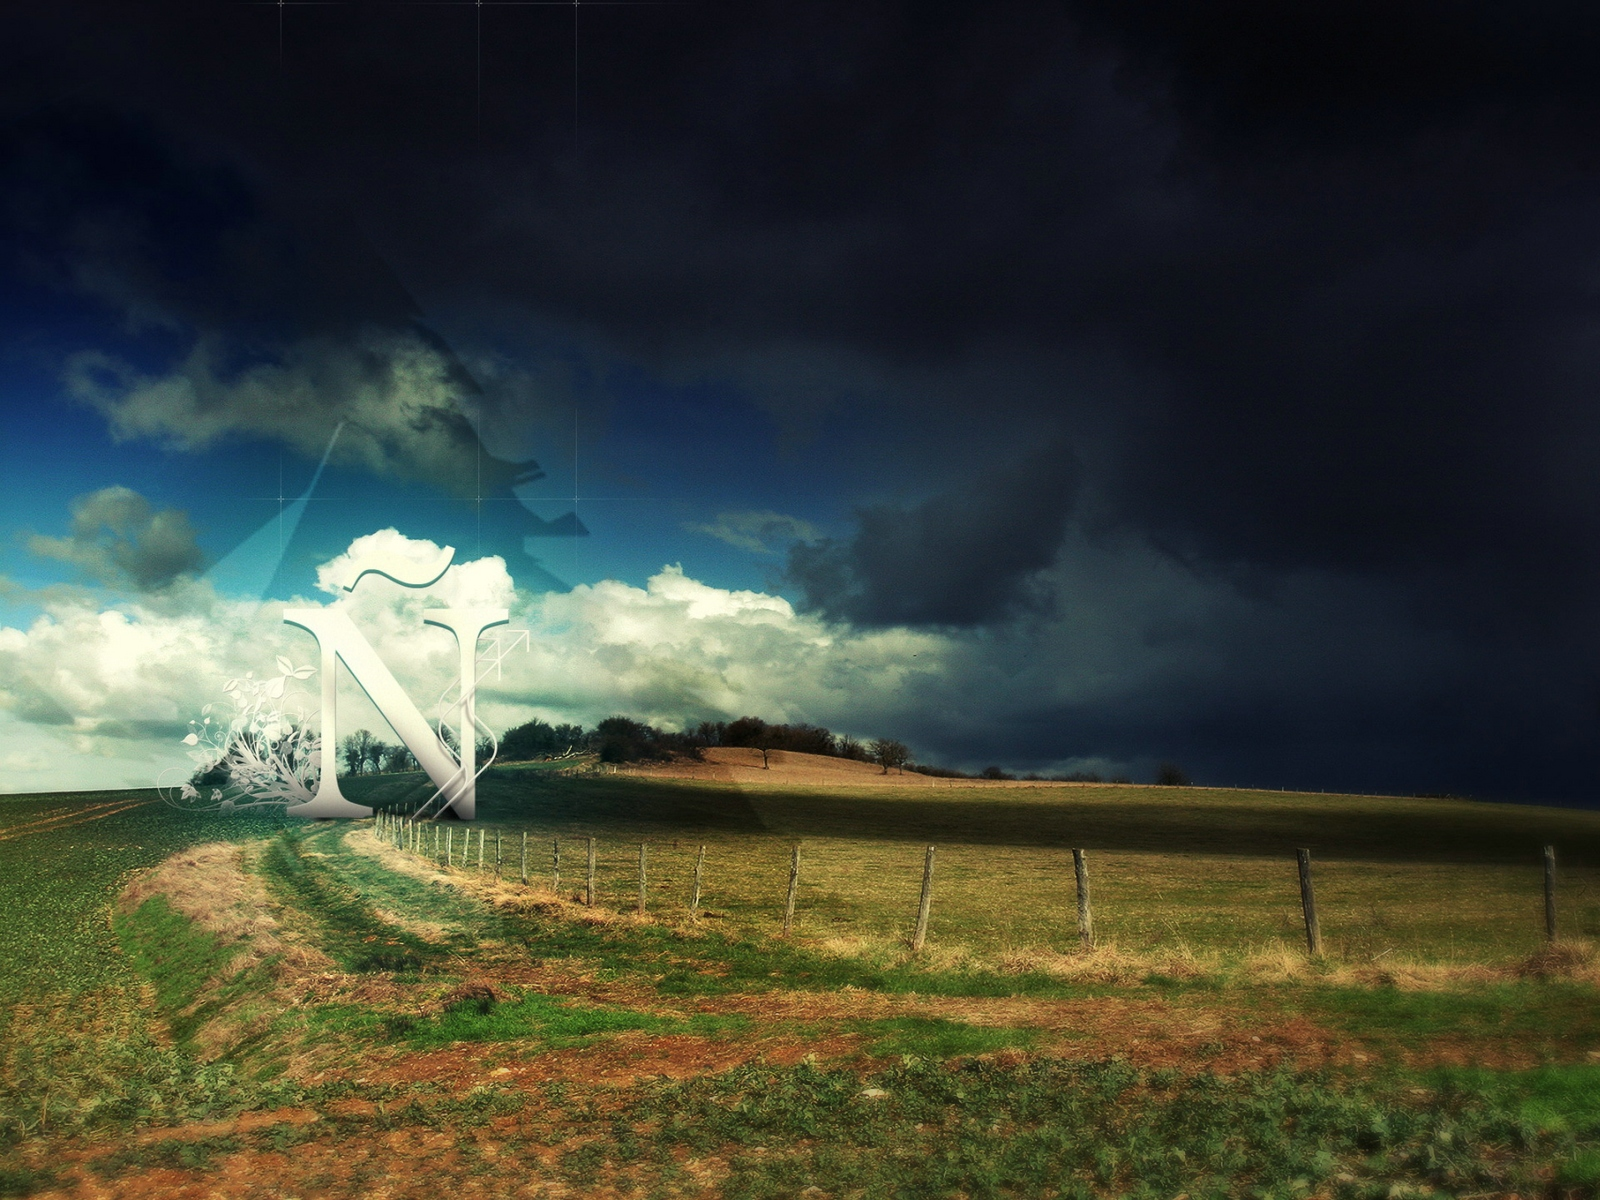 http://3.bp.blogspot.com/-v9Tn73pByxg/UAk-dk7_3sI/AAAAAAAAAts/R4LsAMavfFk/s1600/galaxy-nexus-wallpaper-village.jpg